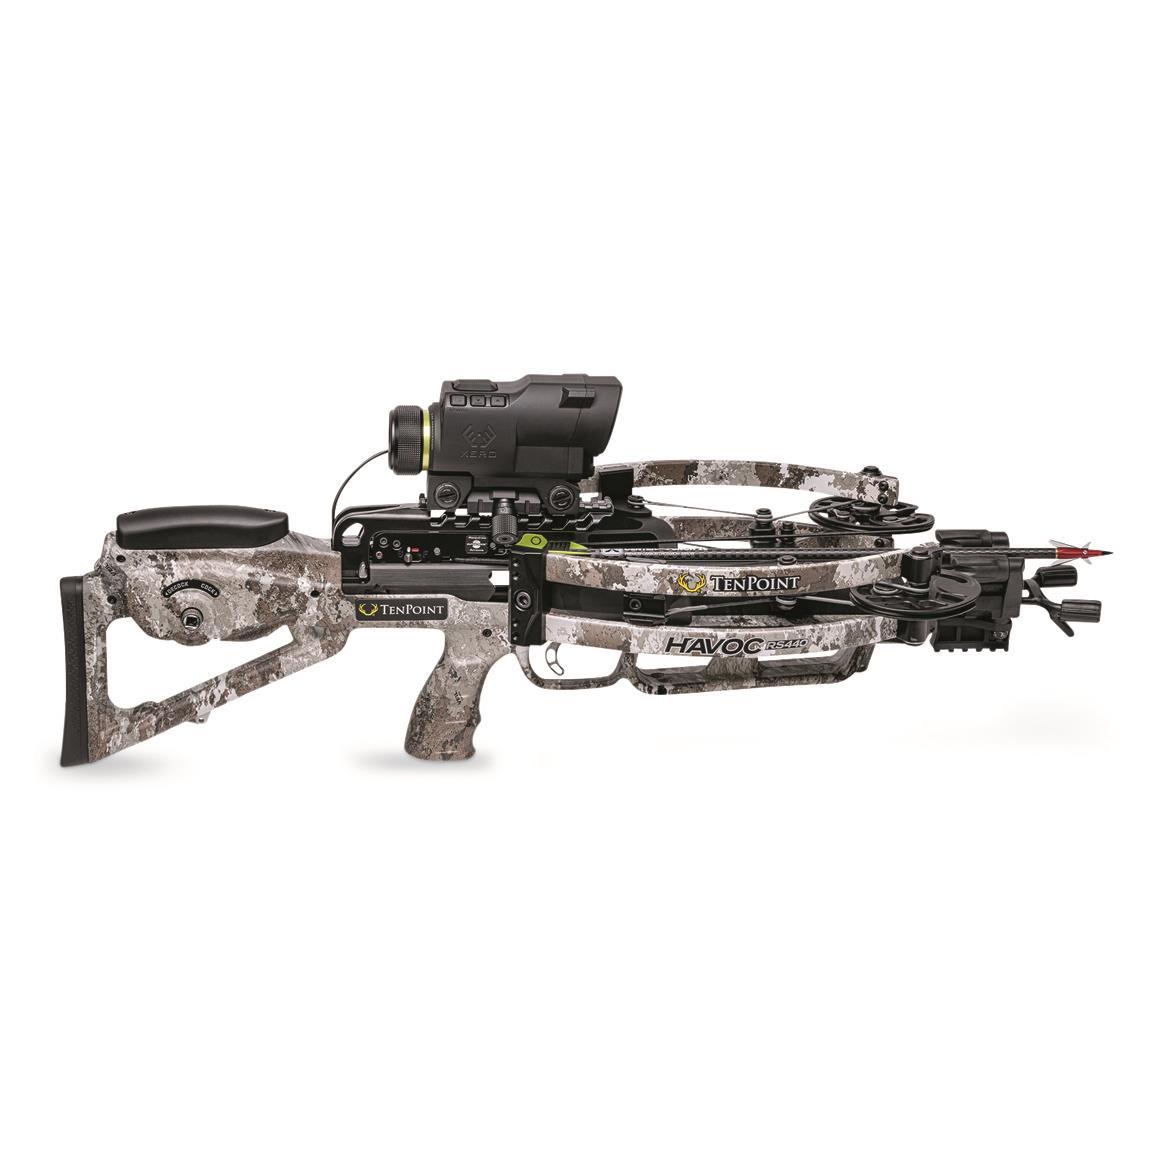 TenPoint Havoc RS440 Crossbow Package with Garmin Xero X1i Scope